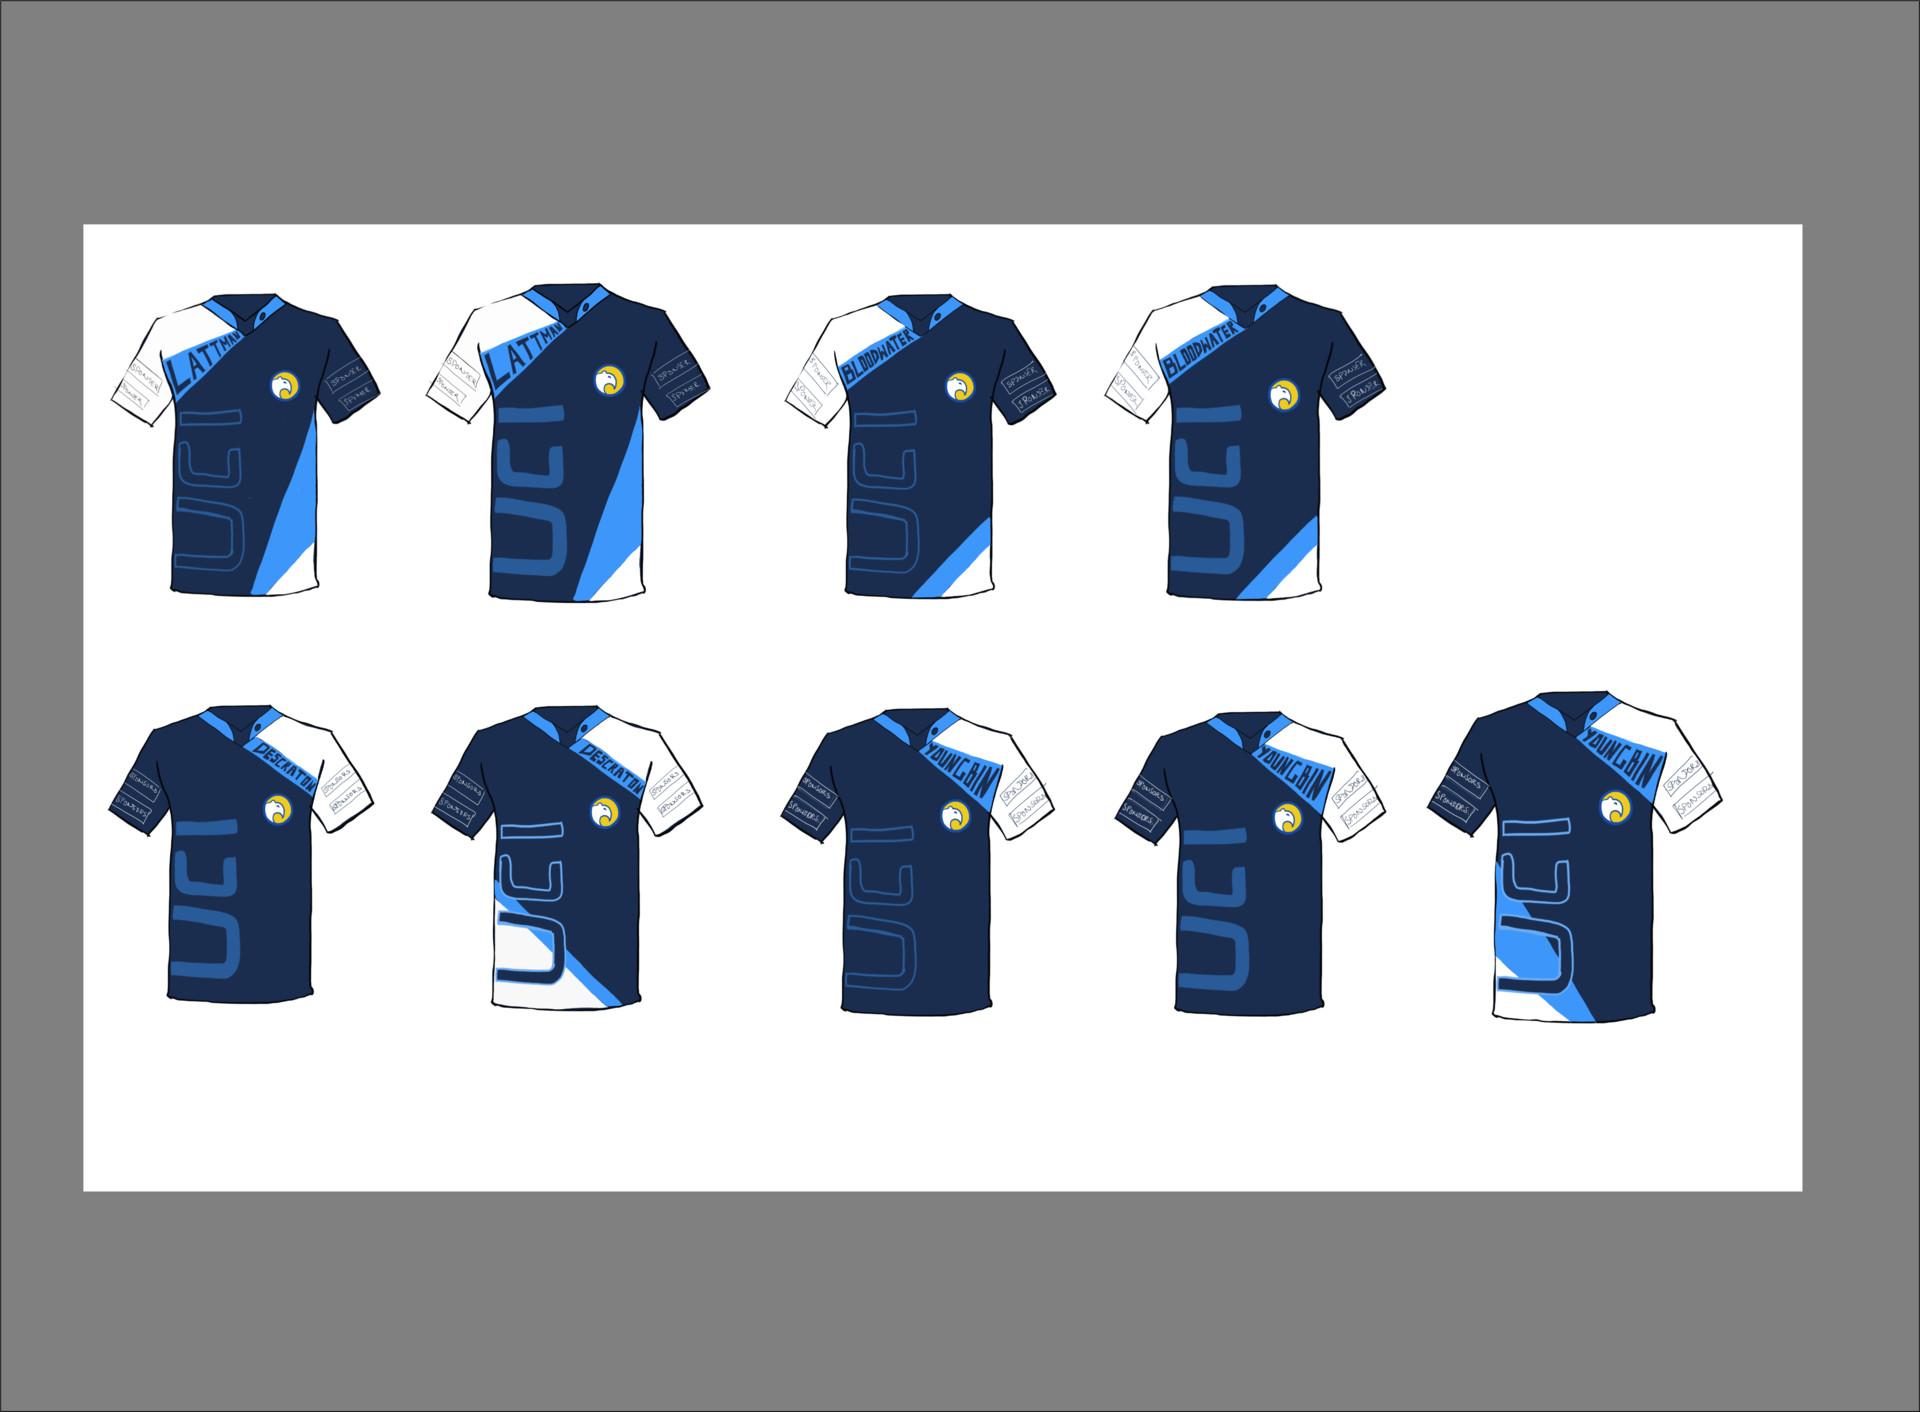 Dishanth Shankar Reddy - UCI Esports Jersey Design Ideas 2018